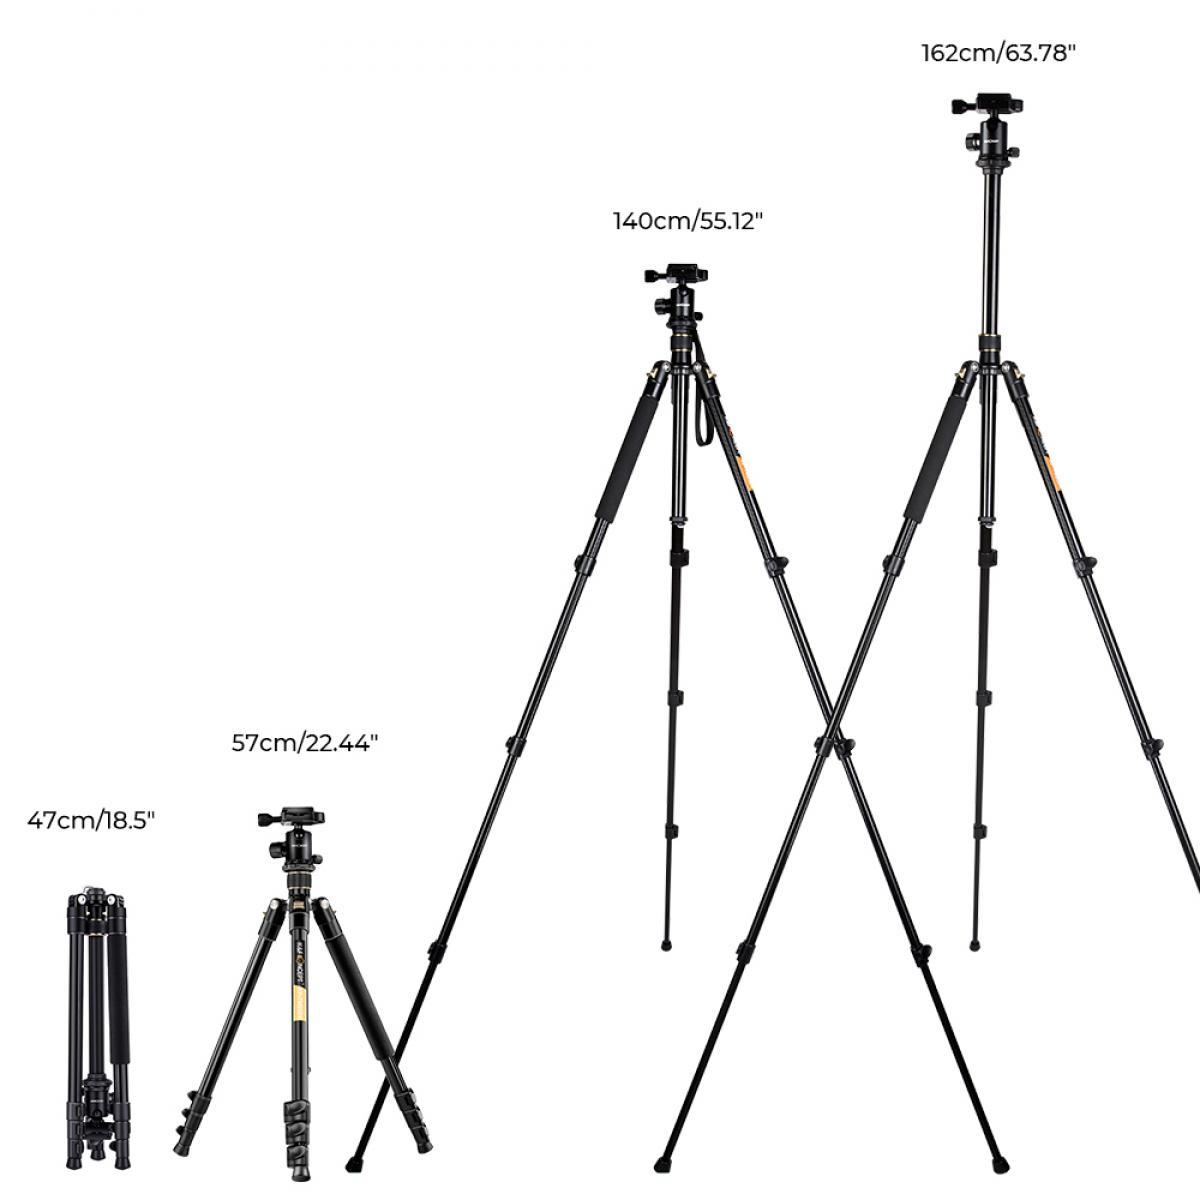 TM2324 Lightweight Travel Tripod for DSLR Camera 62 Inch Aluminum Ball Head 4 Sections